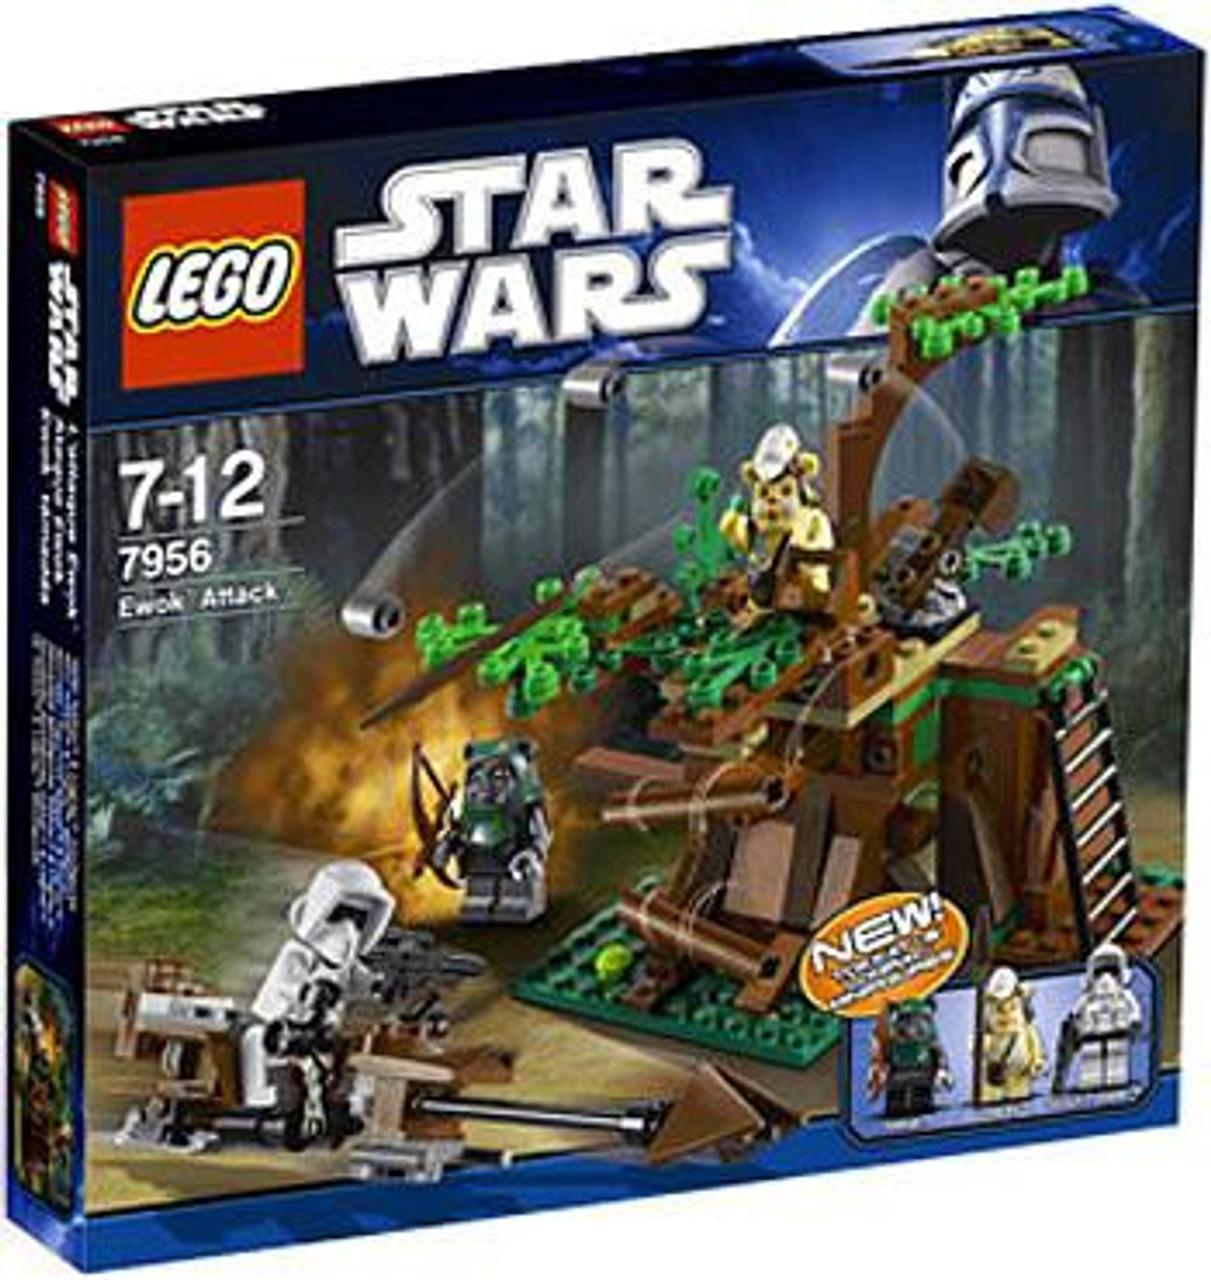 LEGO Star Wars Return of the Jedi Ewok Attack Set #7956